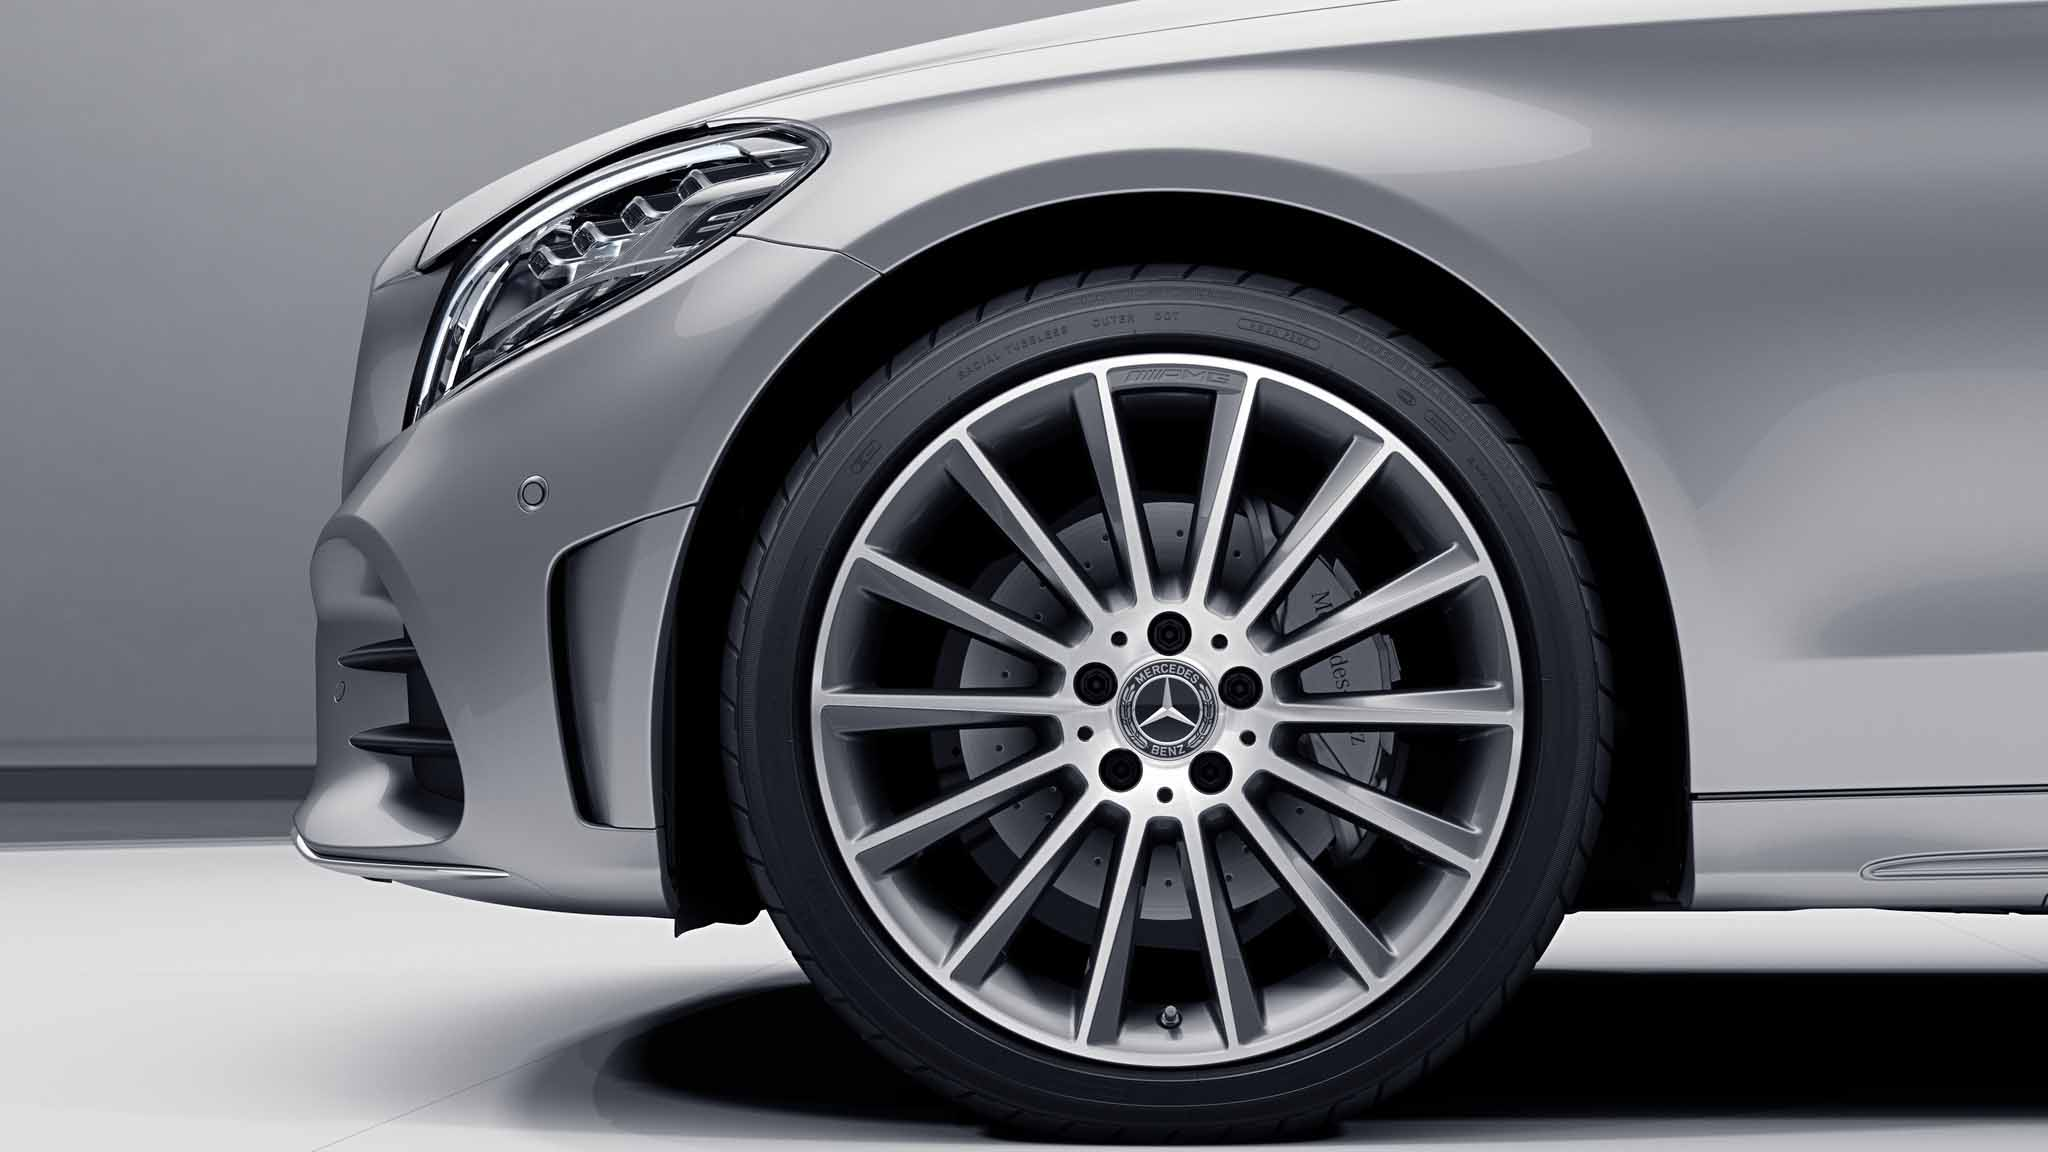 Jantes AMG 19 multibranches de la Mercedes-Benz Classe C Berline